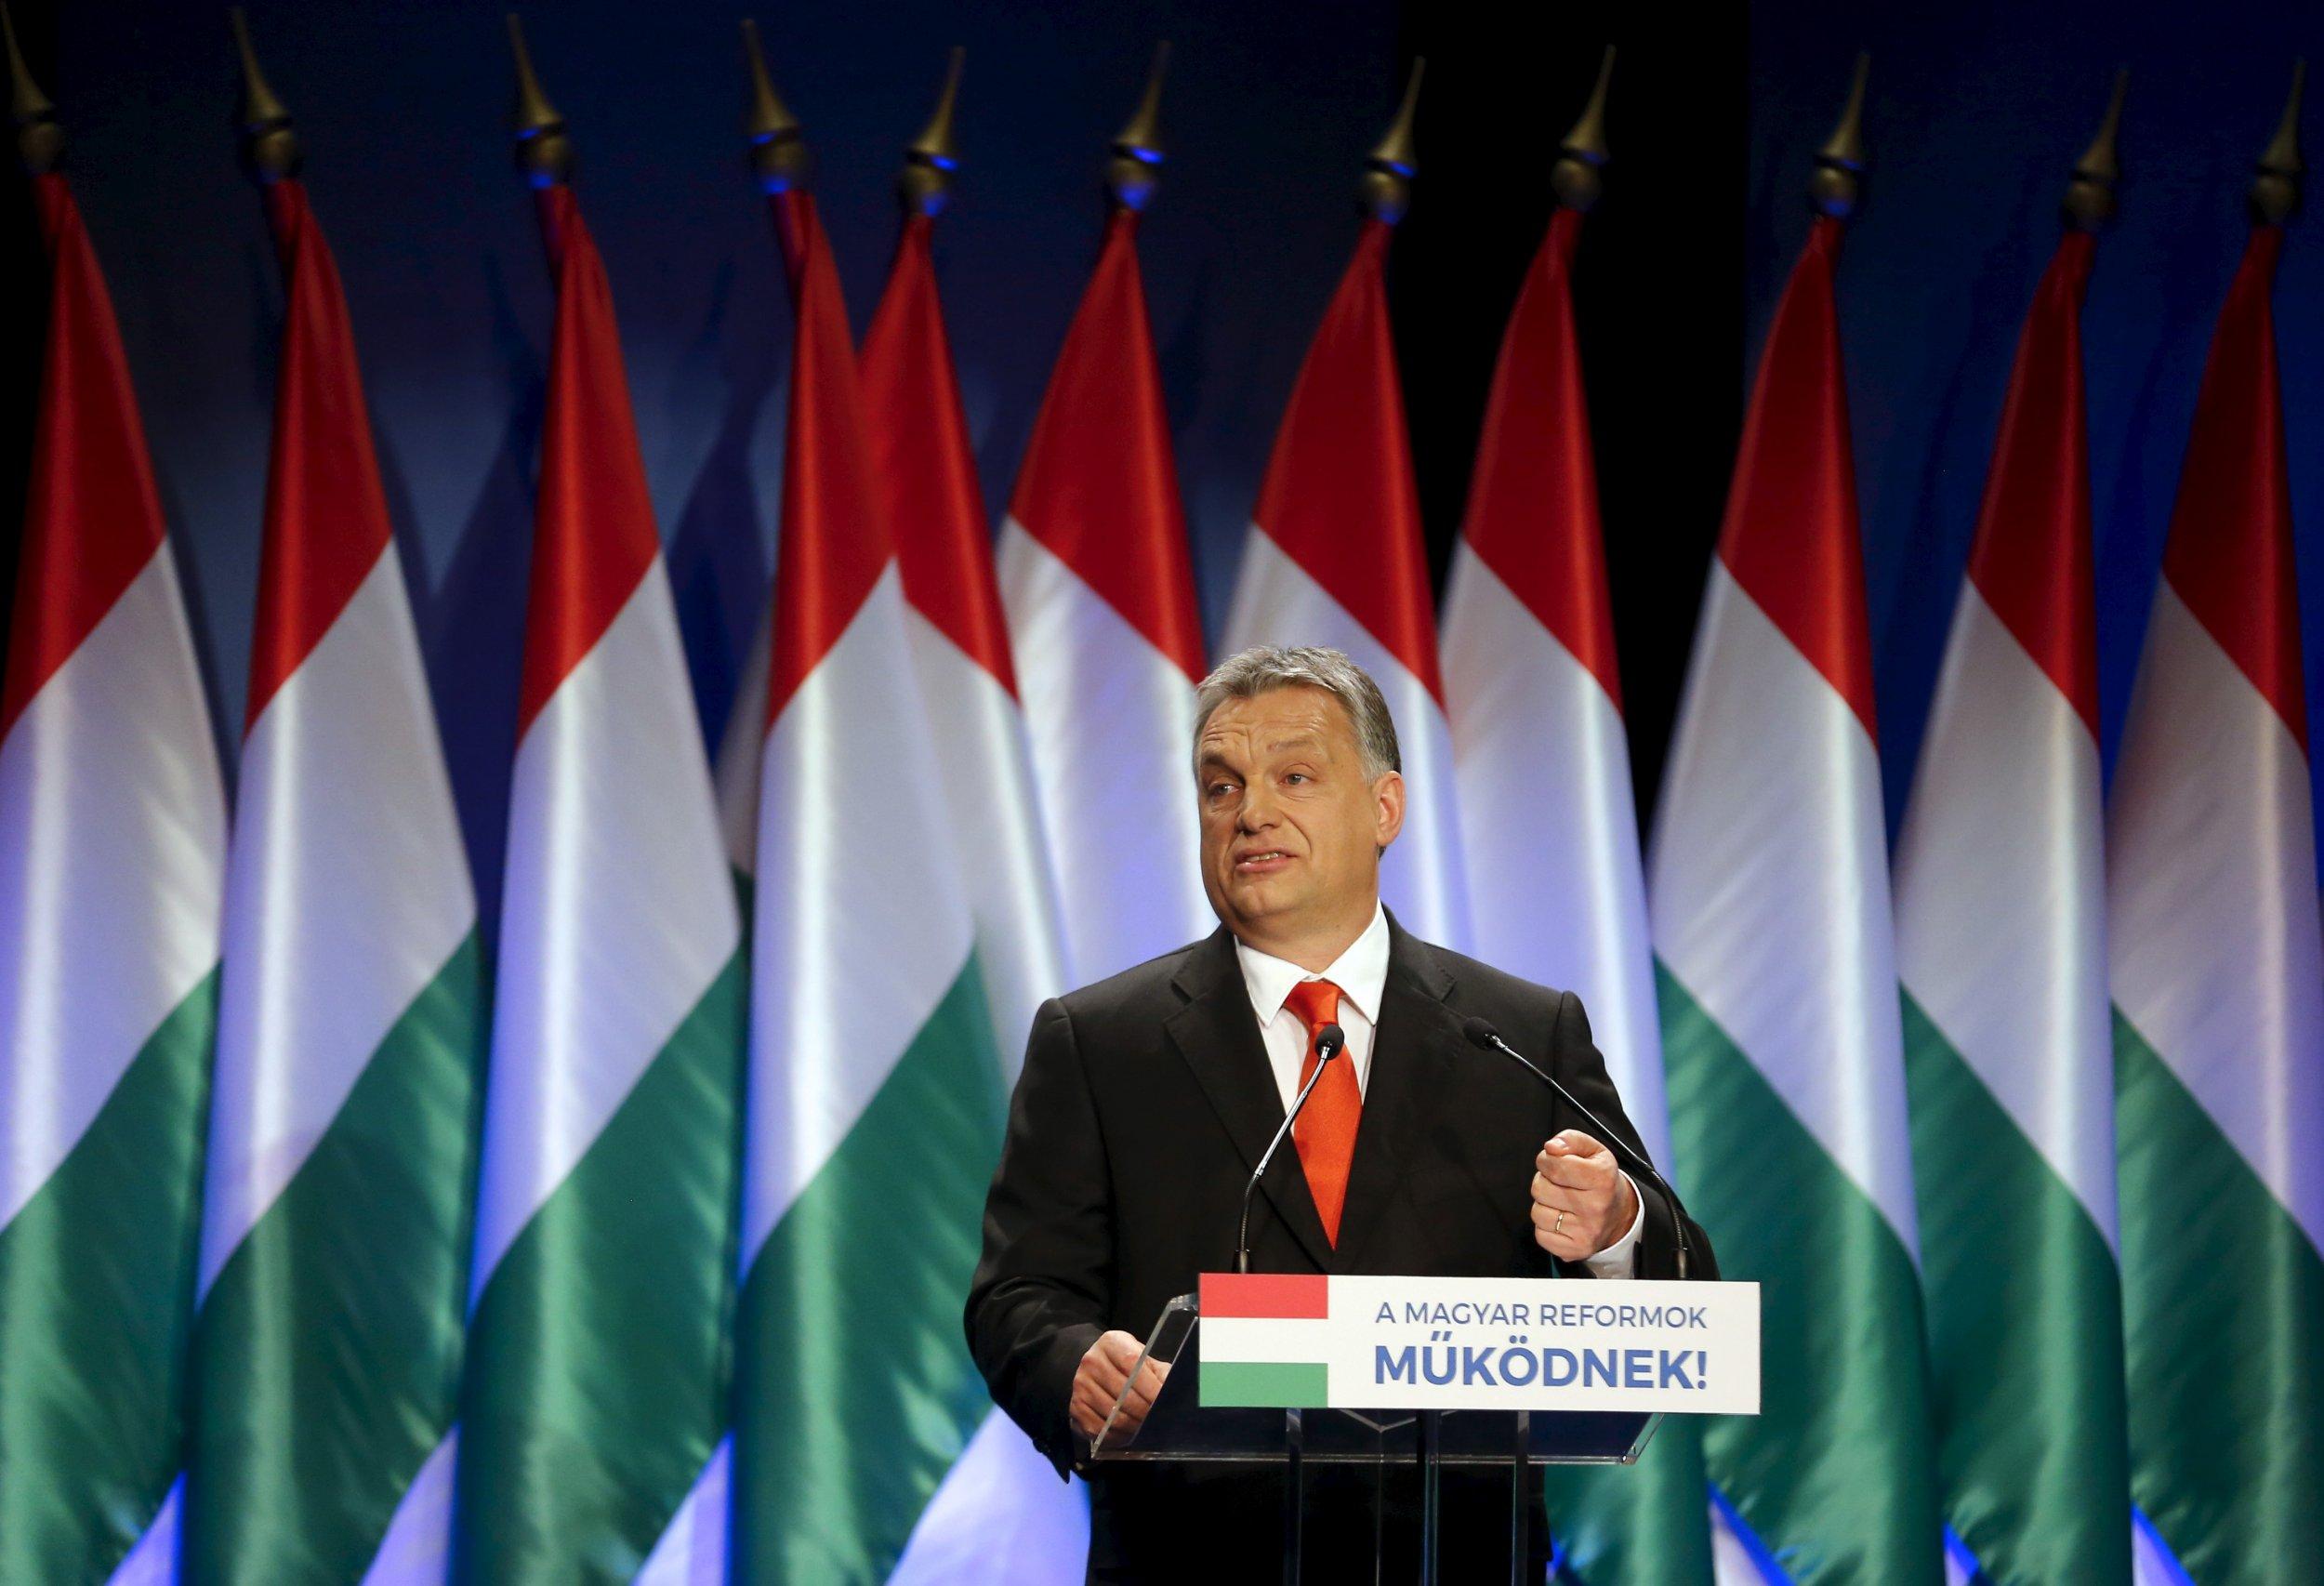 Viktor Orban speaks in front of Hungarian flags